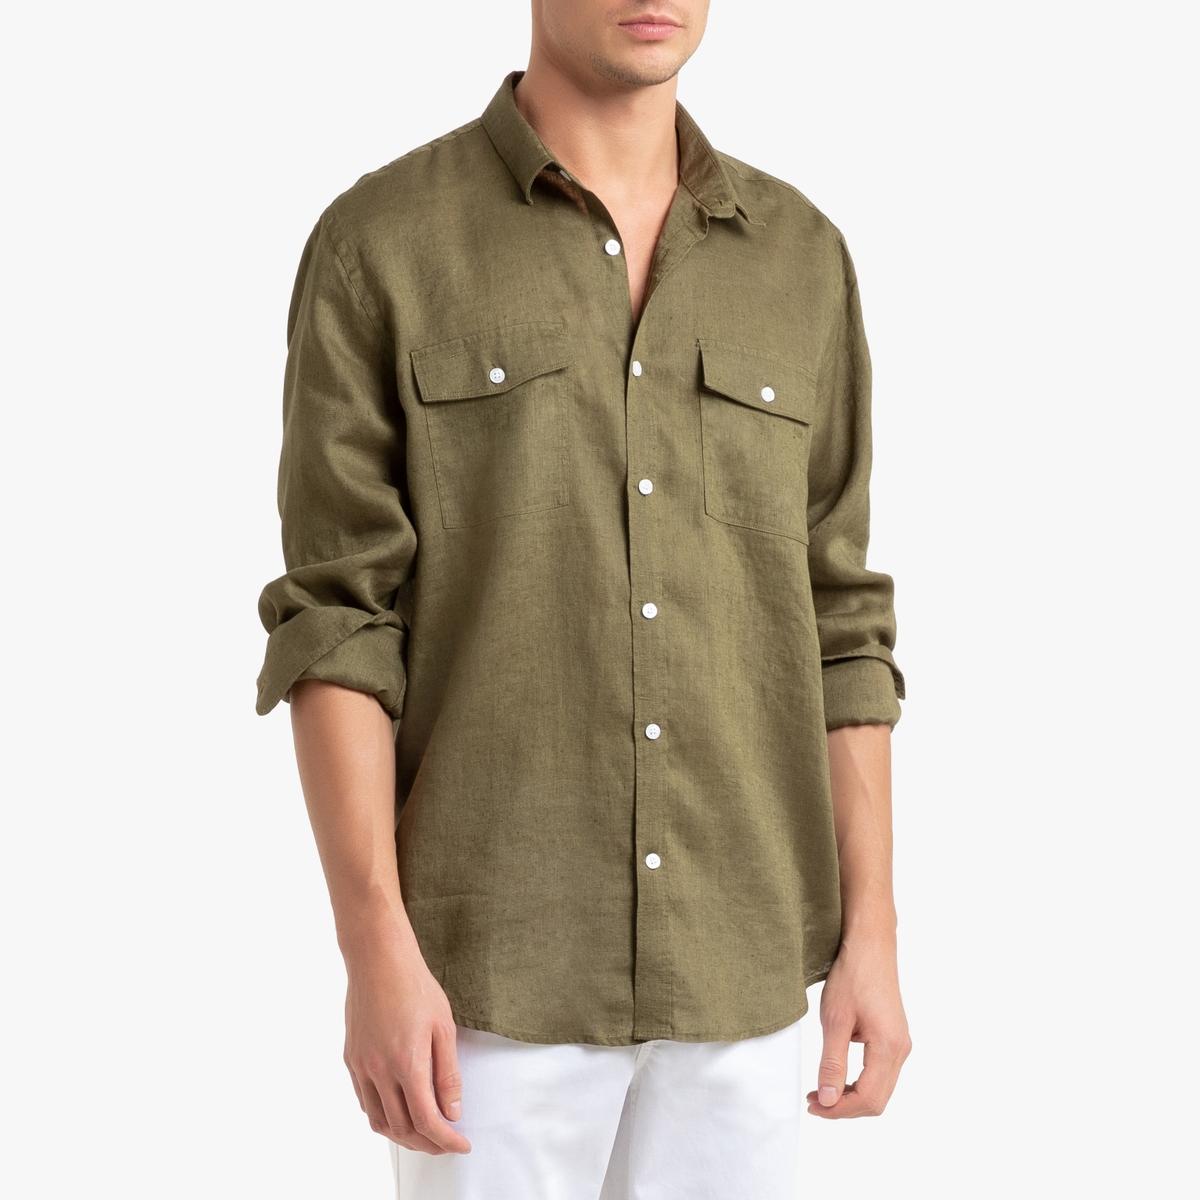 Camisa recta de lino